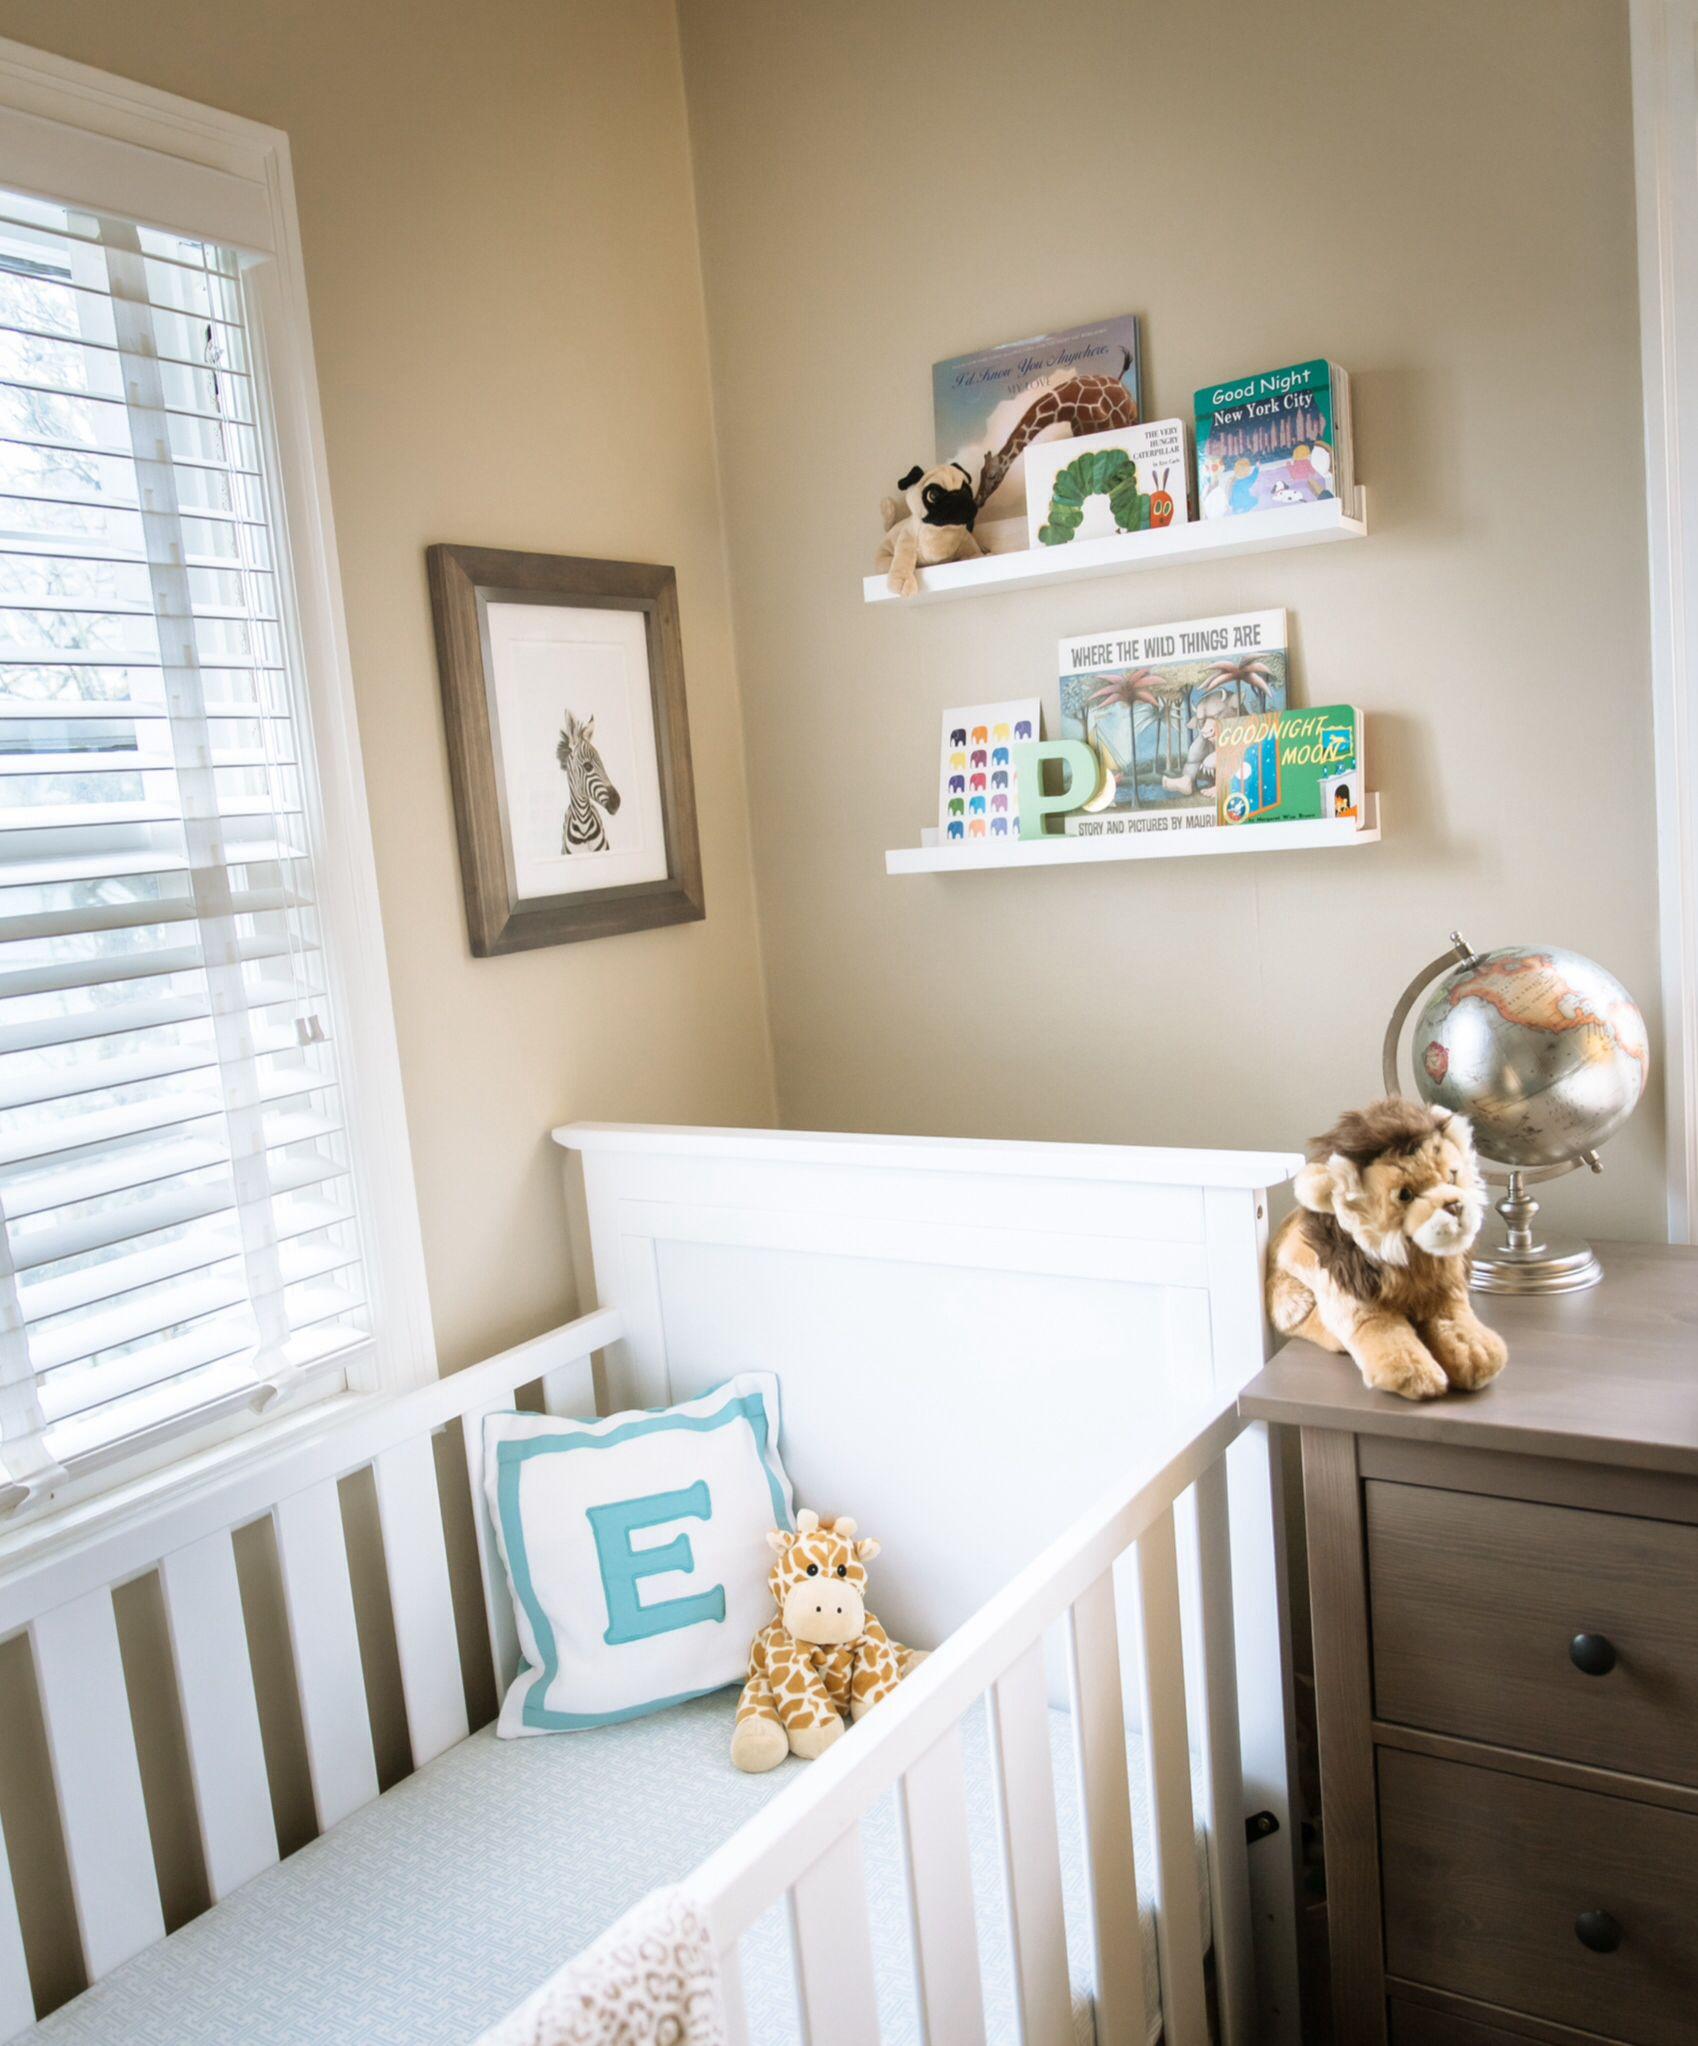 Everett's safari nursery crib and book shelves